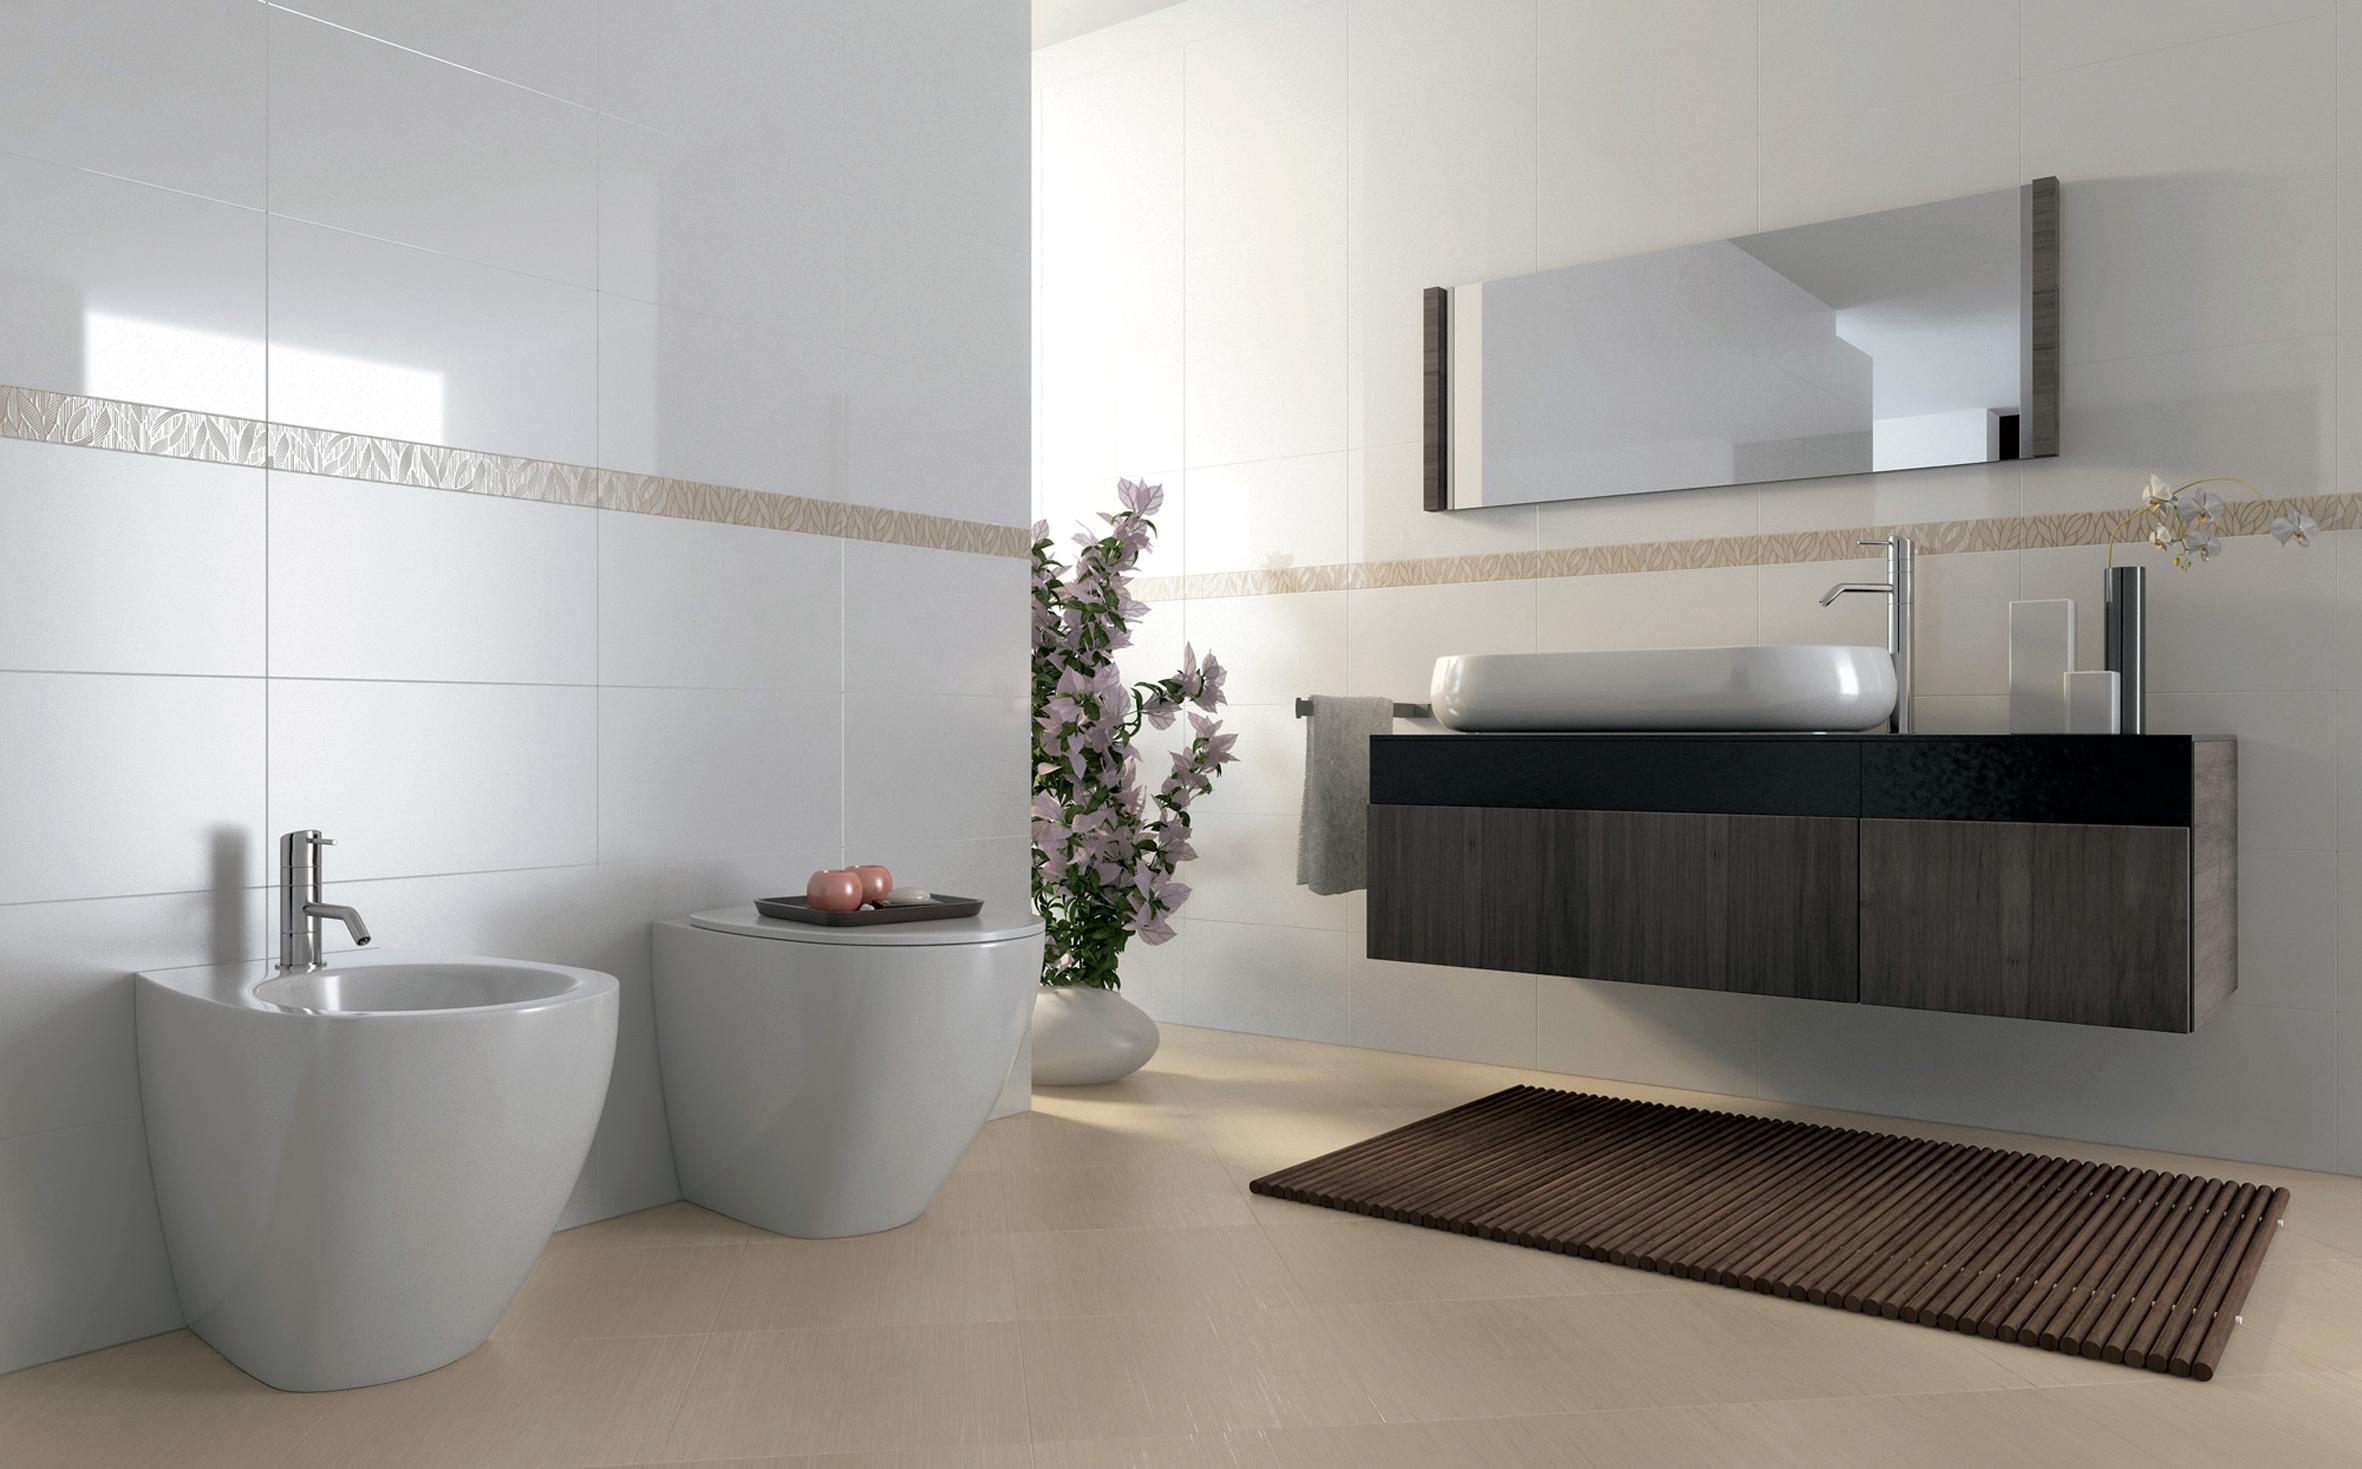 Bathroom Destination Press Release